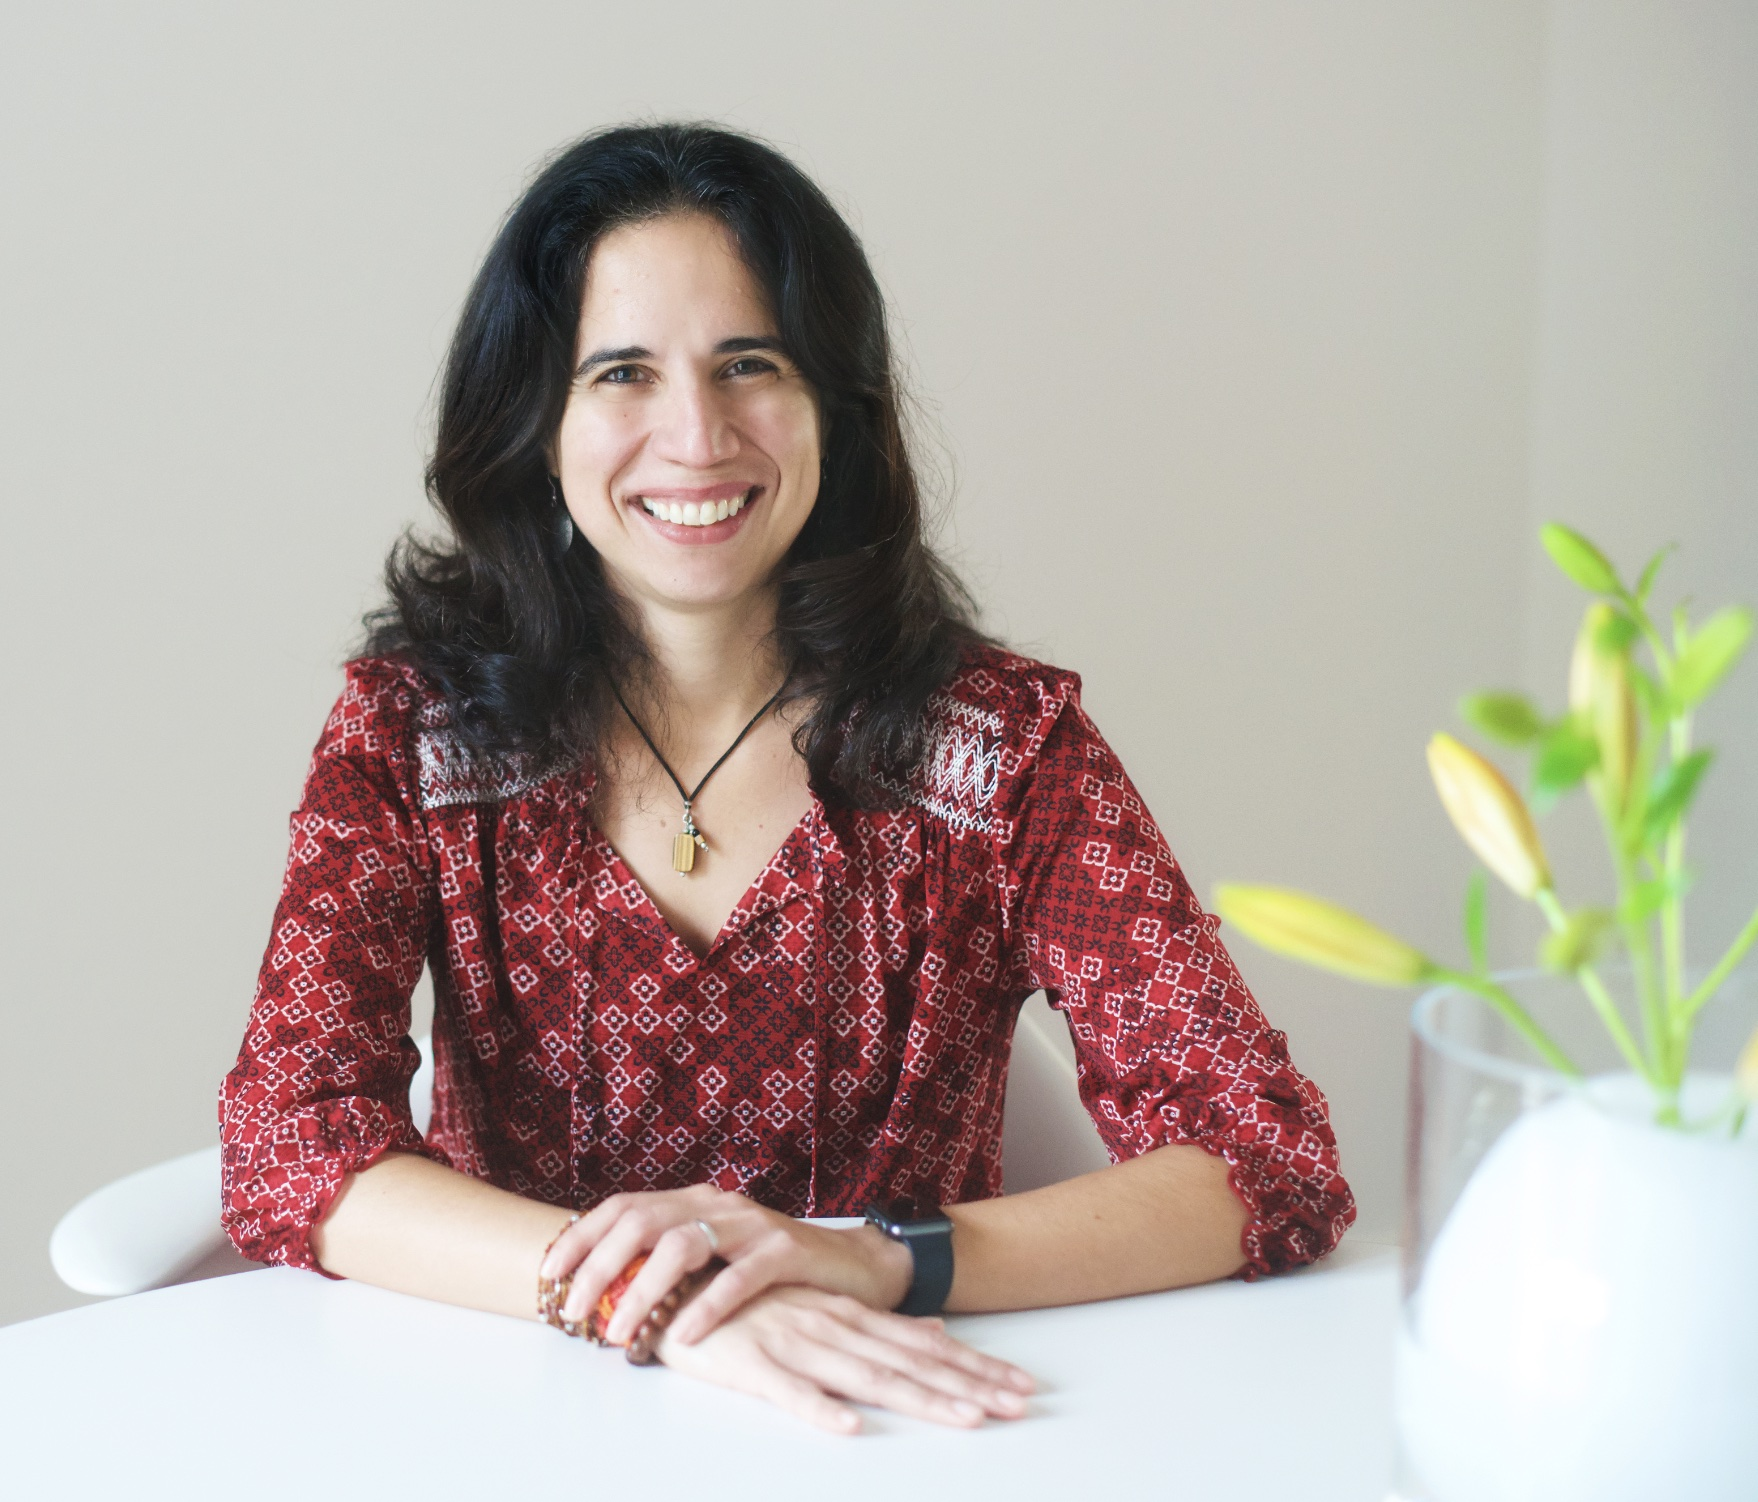 Lorena Moscardelli